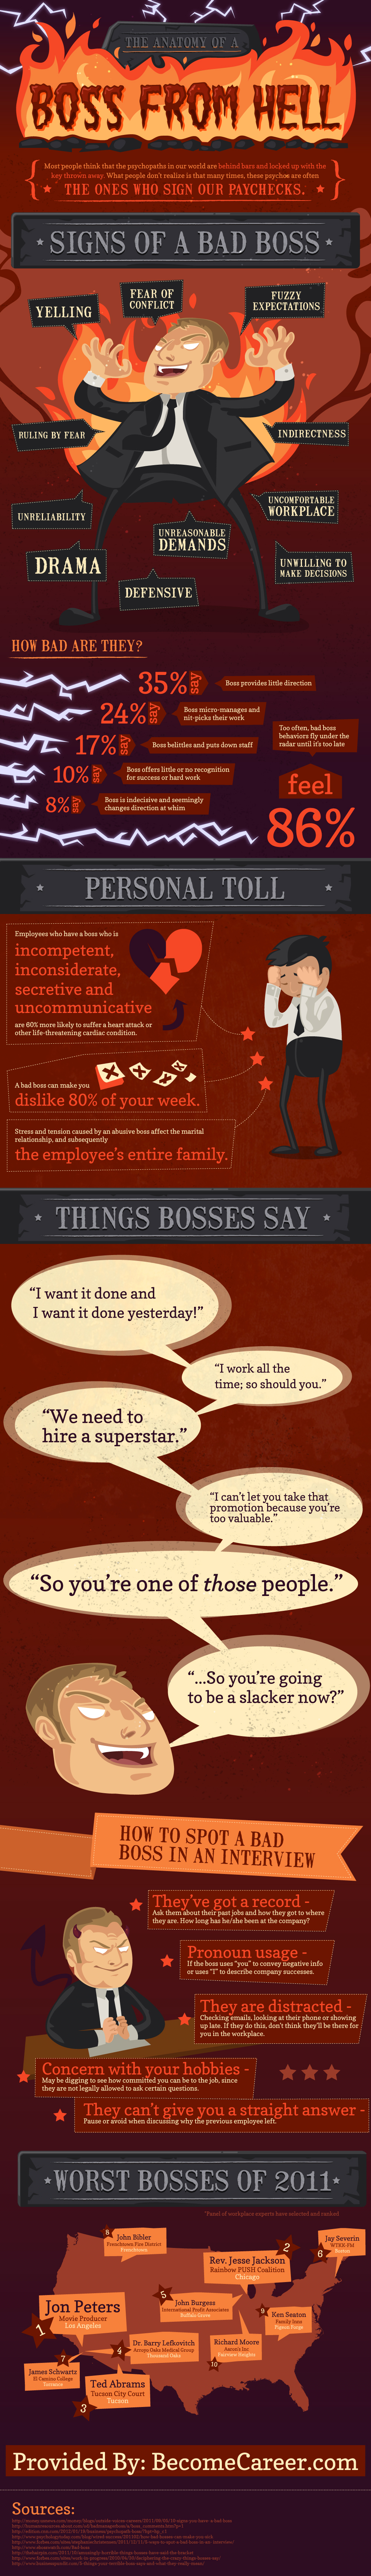 Graphic Design Services and Strategy Portfolio Bad boss